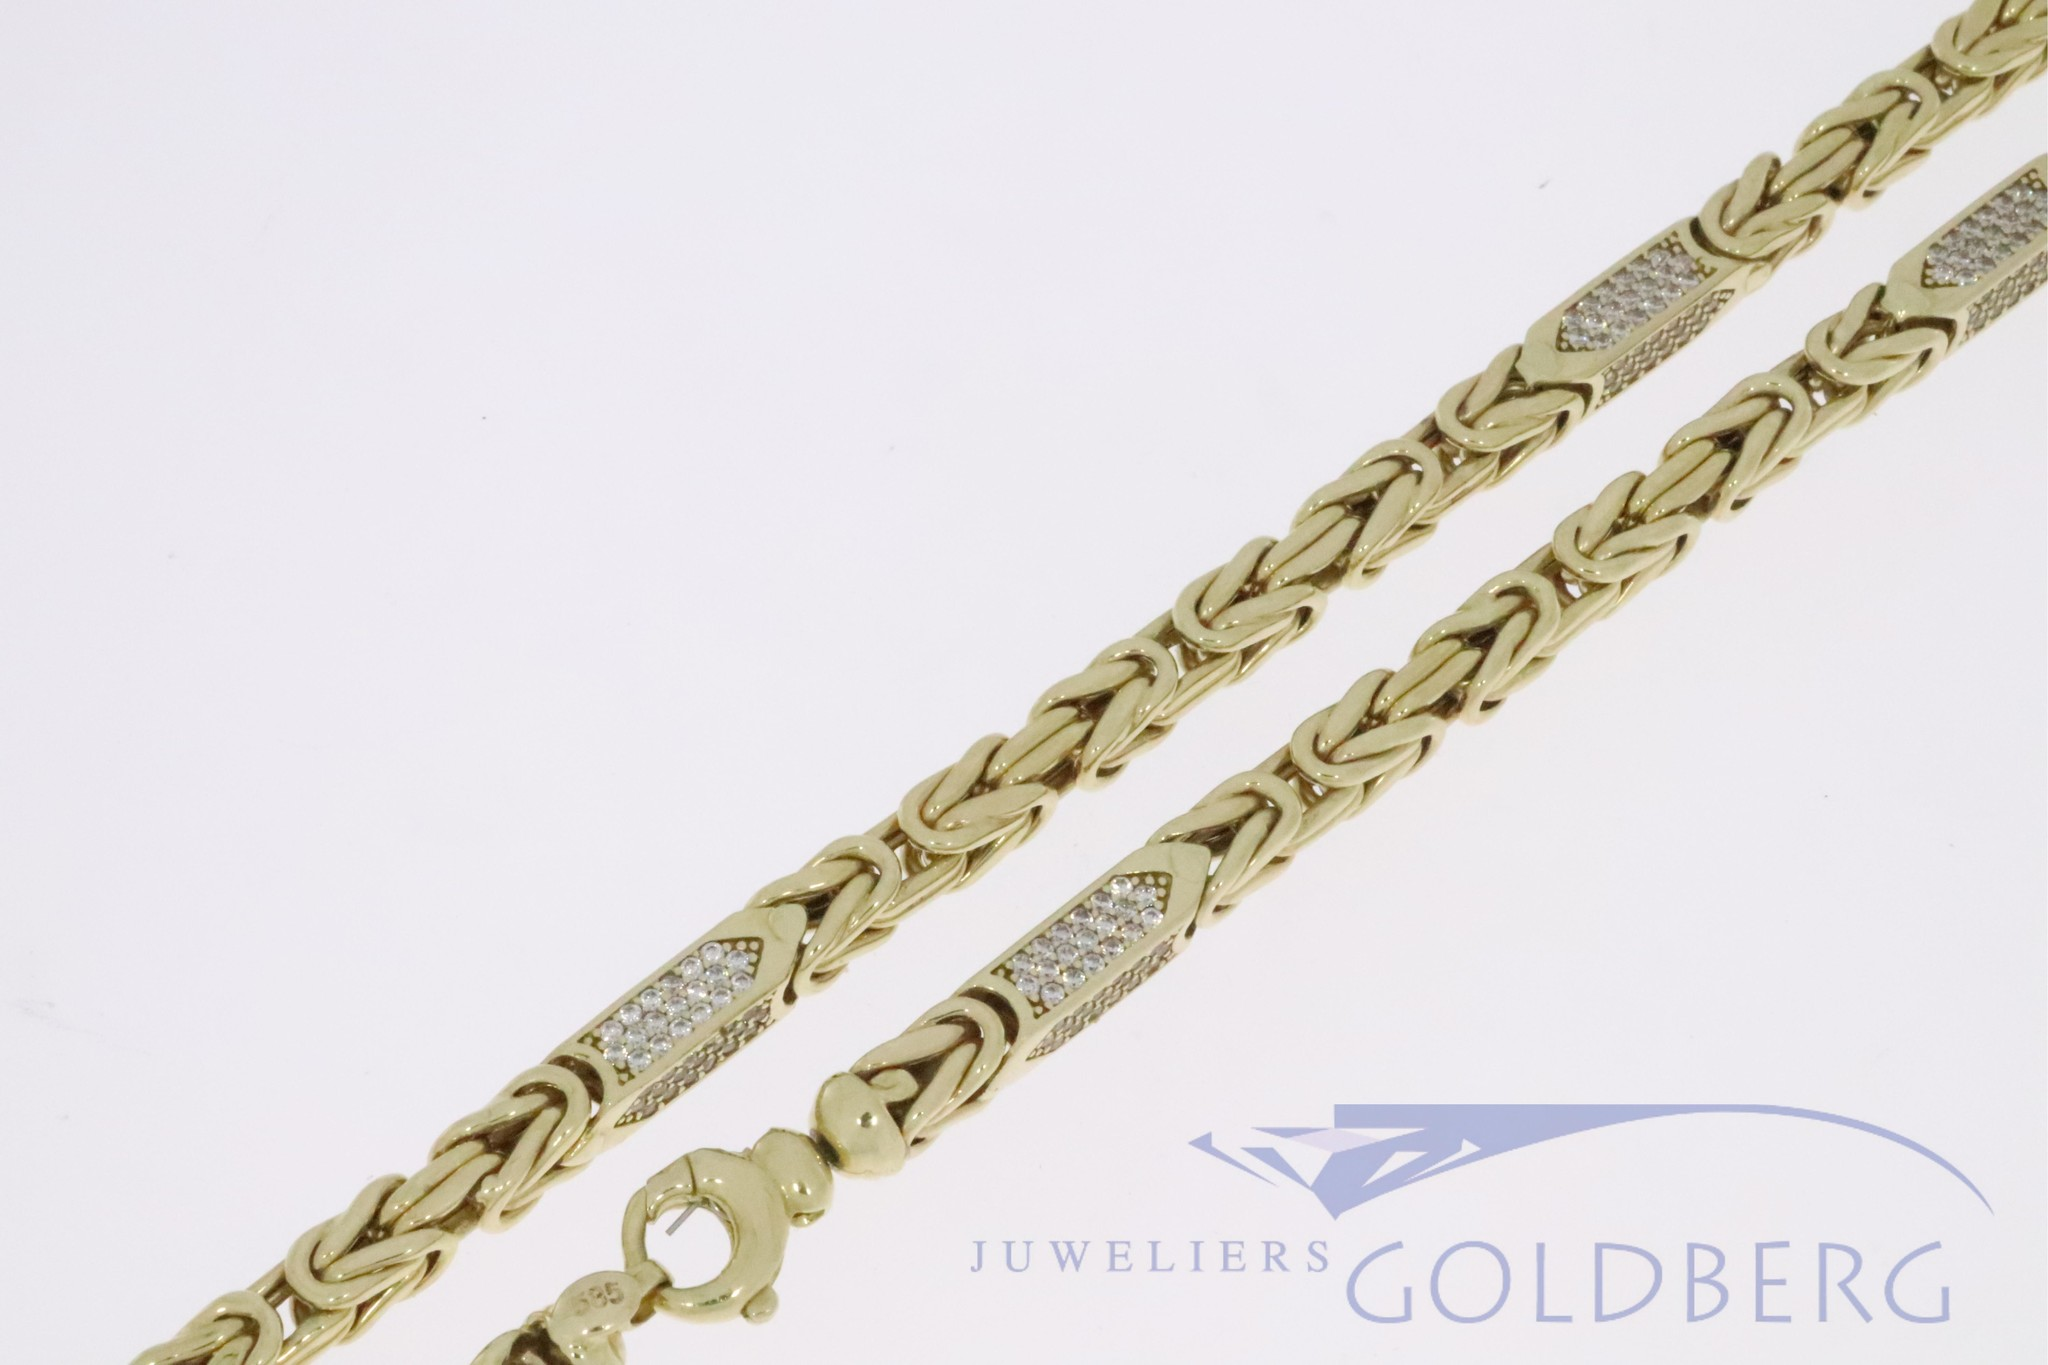 Stevige 14k gouden holle koningsketting met zirconia's  5,2mm en 65cm